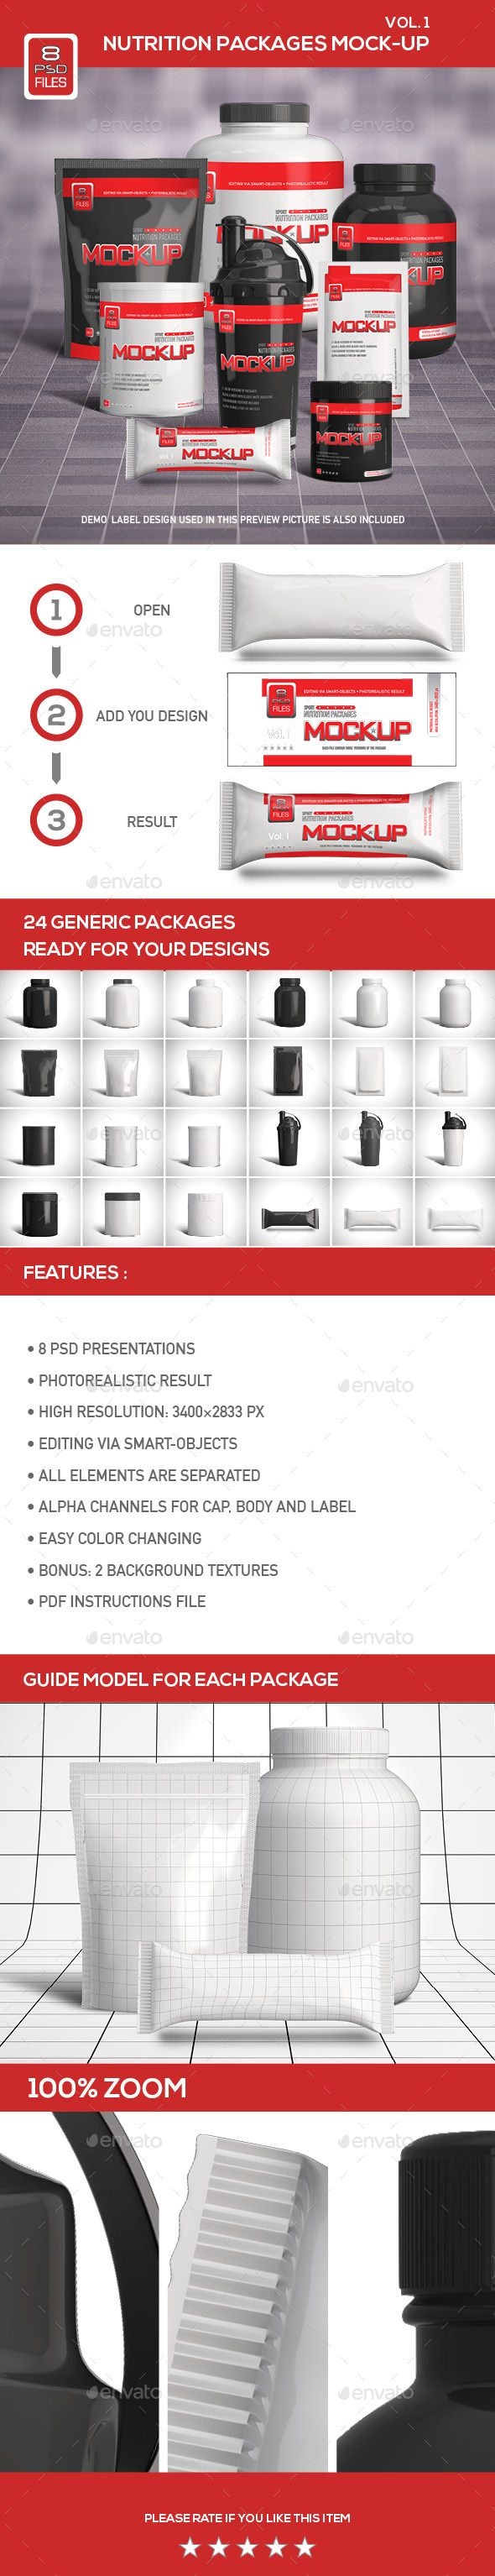 Nutrition Supplement Packages Mock-Up #design Download: http://graphicriver.net/item/nutrition-supplement-packages-mockup/12536682?ref=ksioks